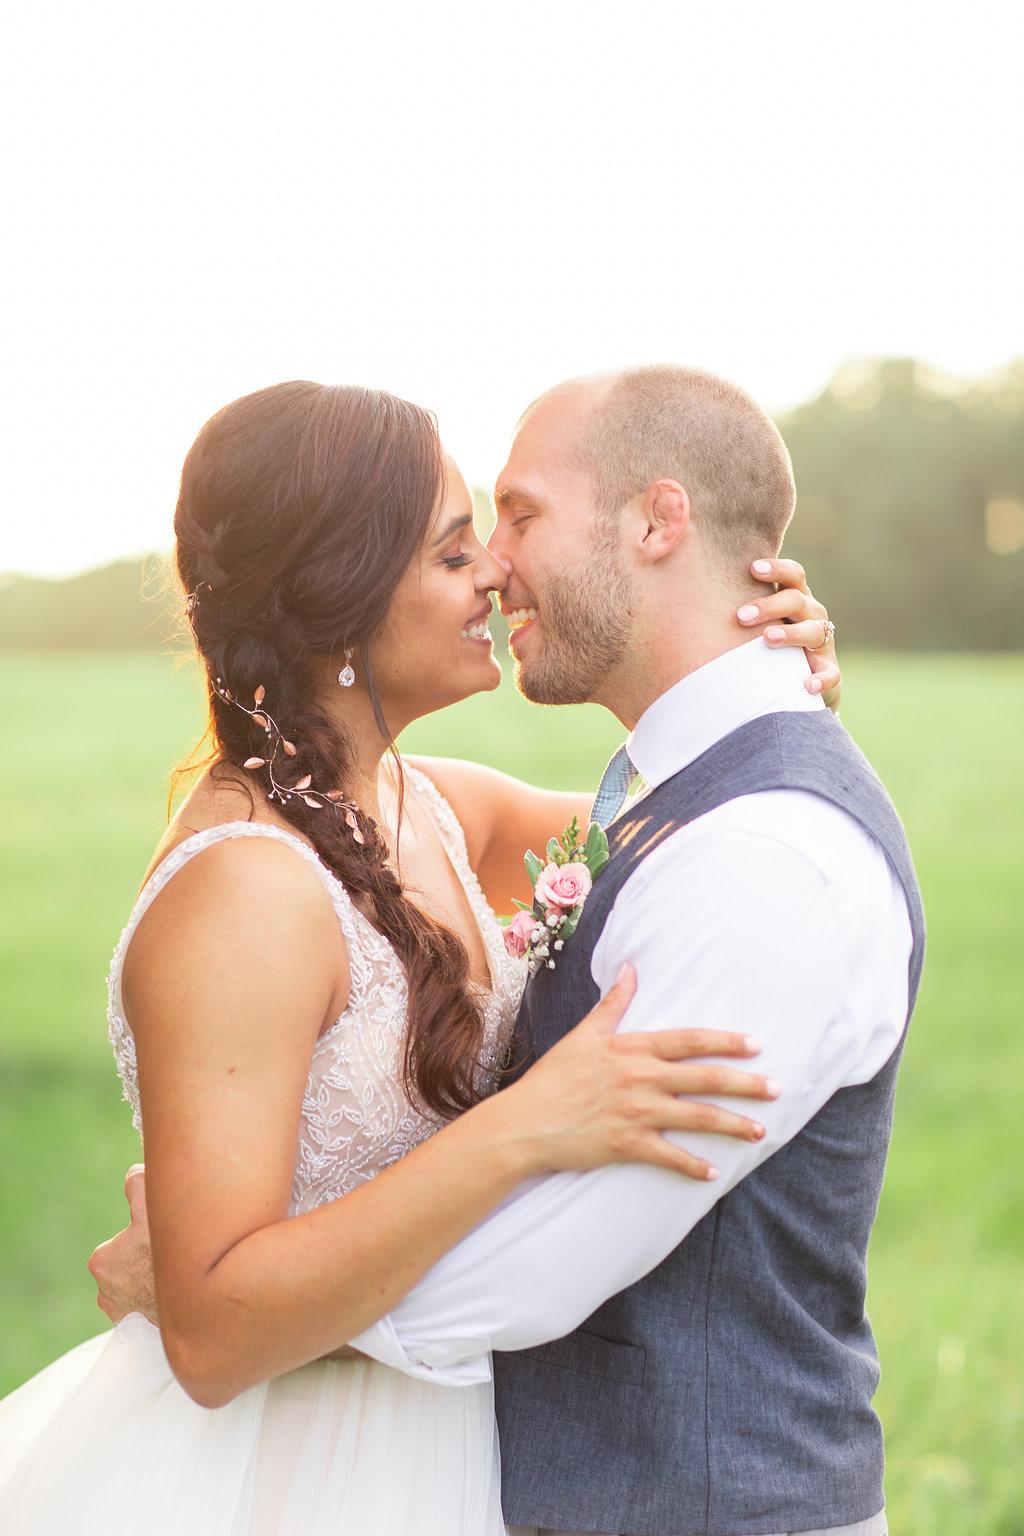 An Intimate Southern Alabama DIY Wedding - The Barn at Twin Valley Wedding - The Overwhelmed Bride Wedding Blog